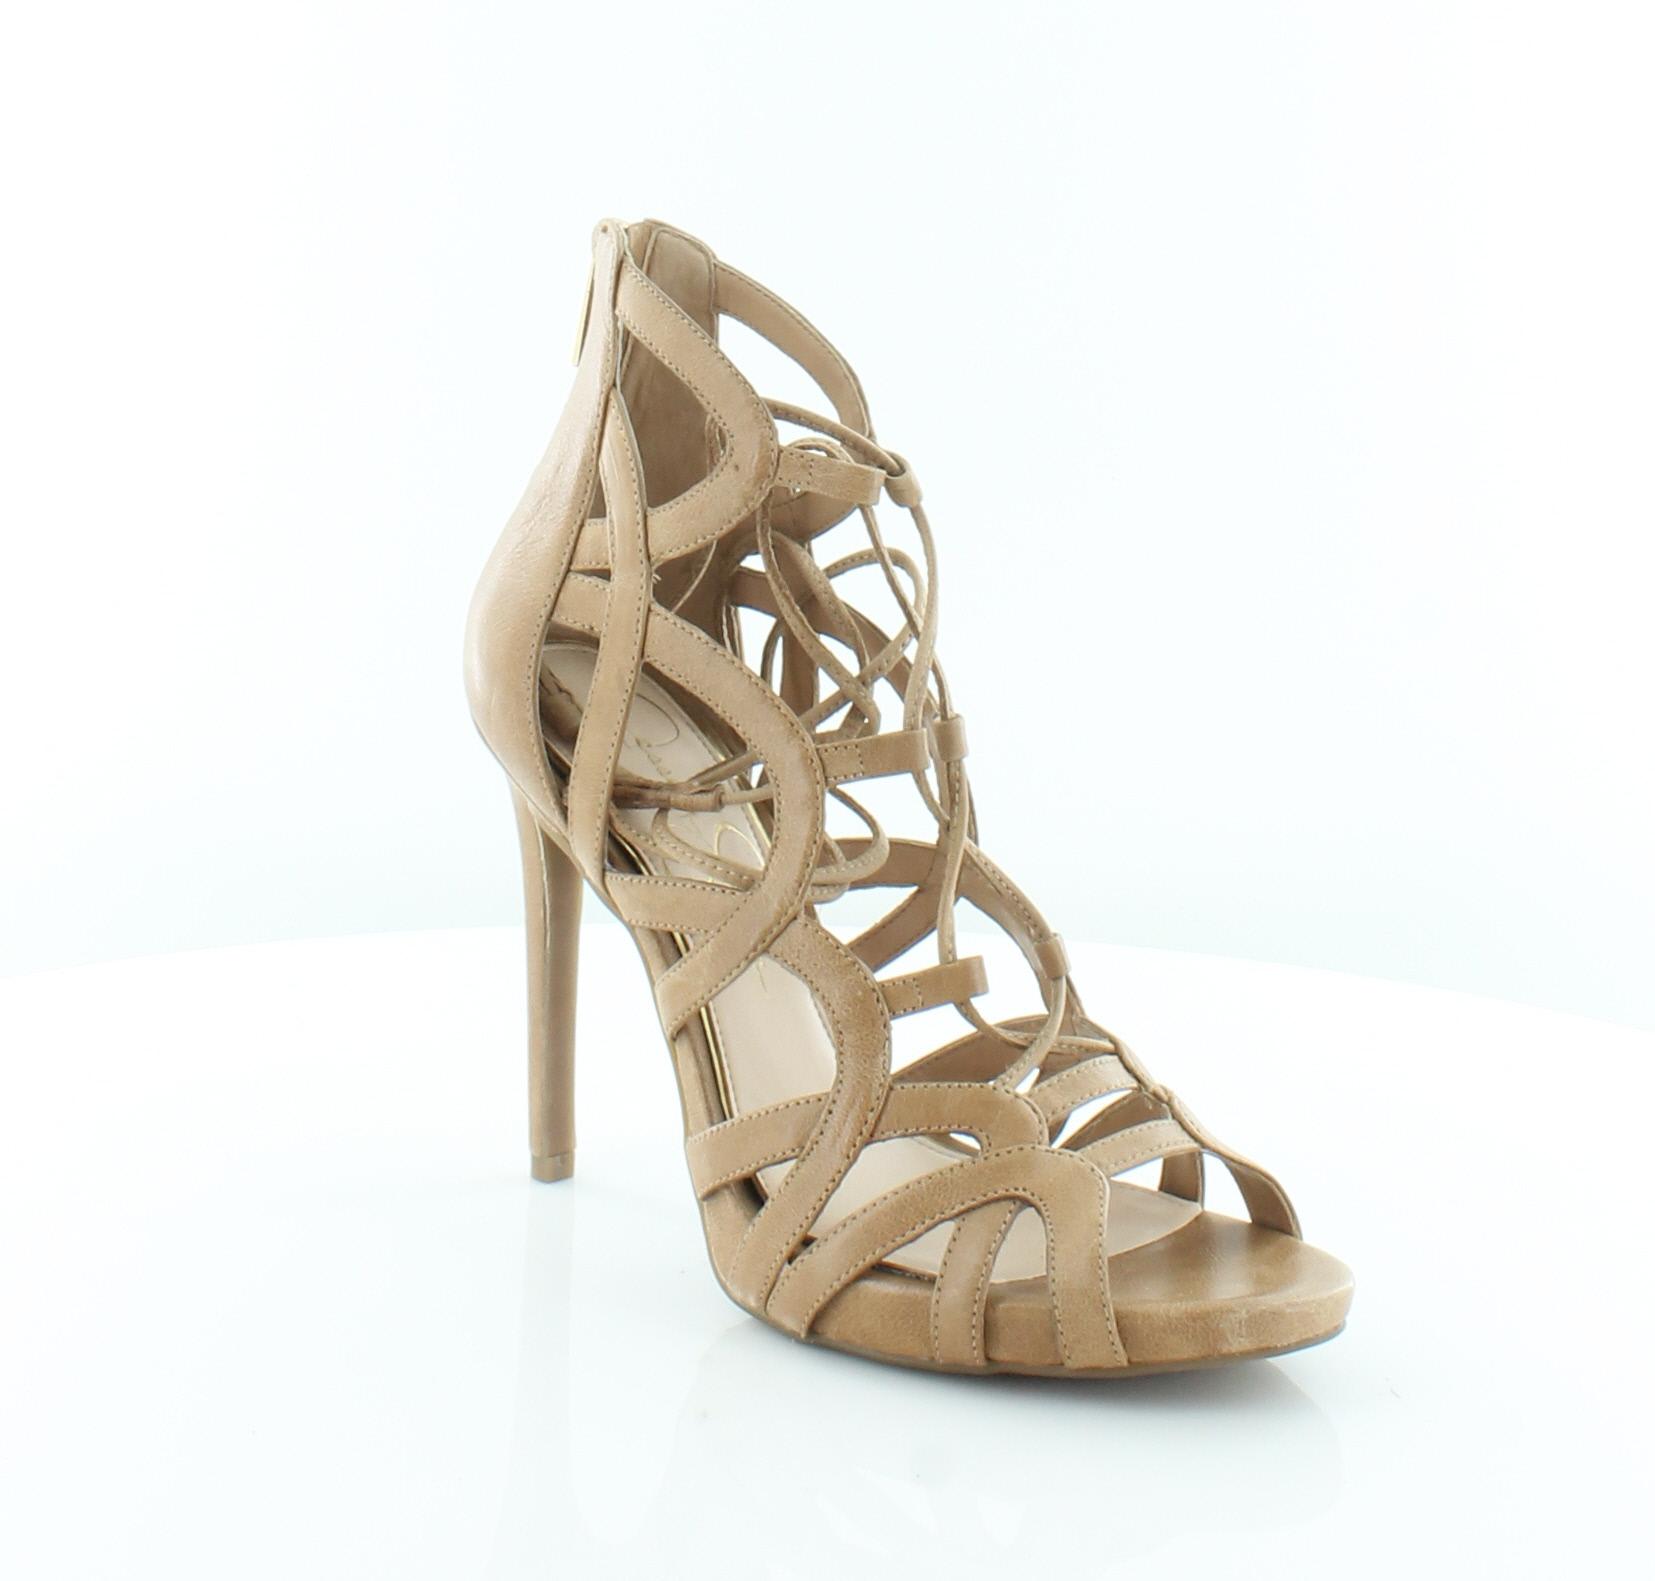 dc28cfc413e8 Jessica Simpson Racine Brown Womens Shoes Size 8.5 M Heels MSRP  110 ...